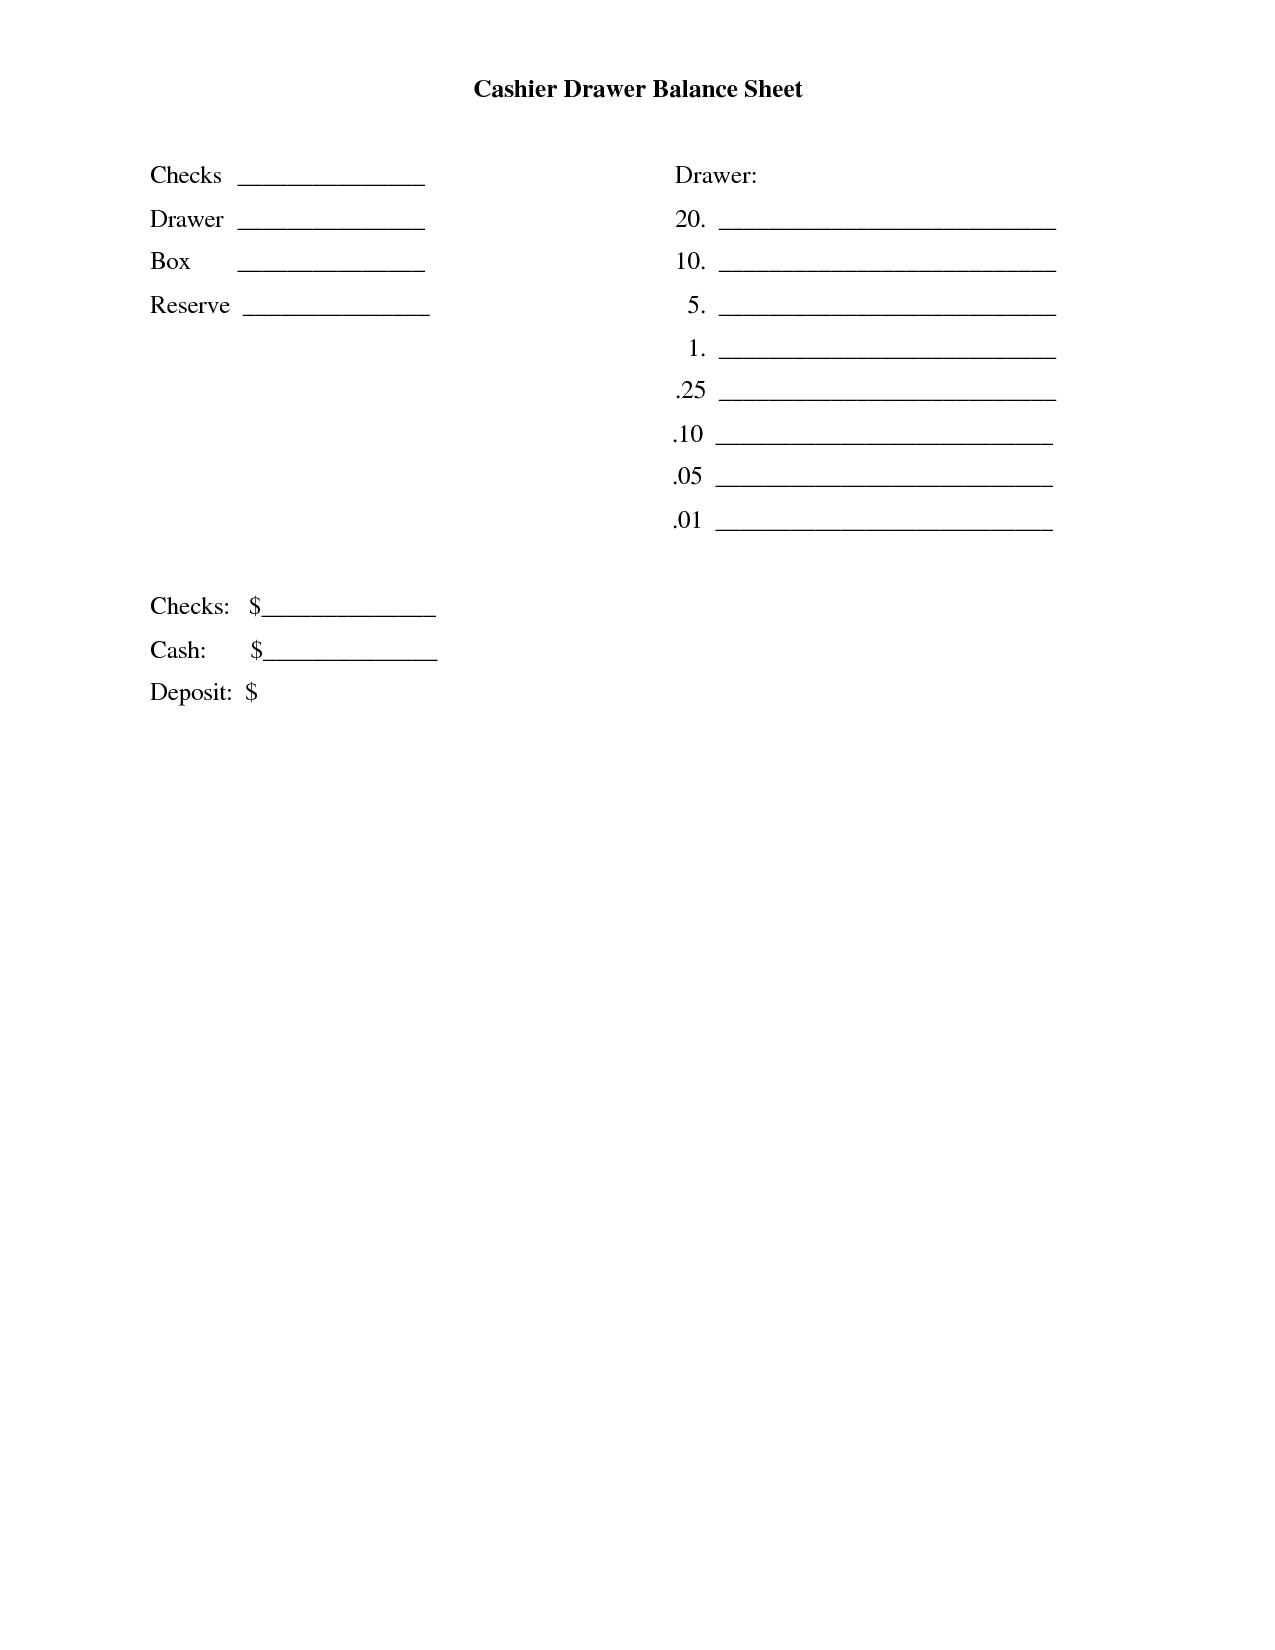 Cash Drawer Balance Sheet Template